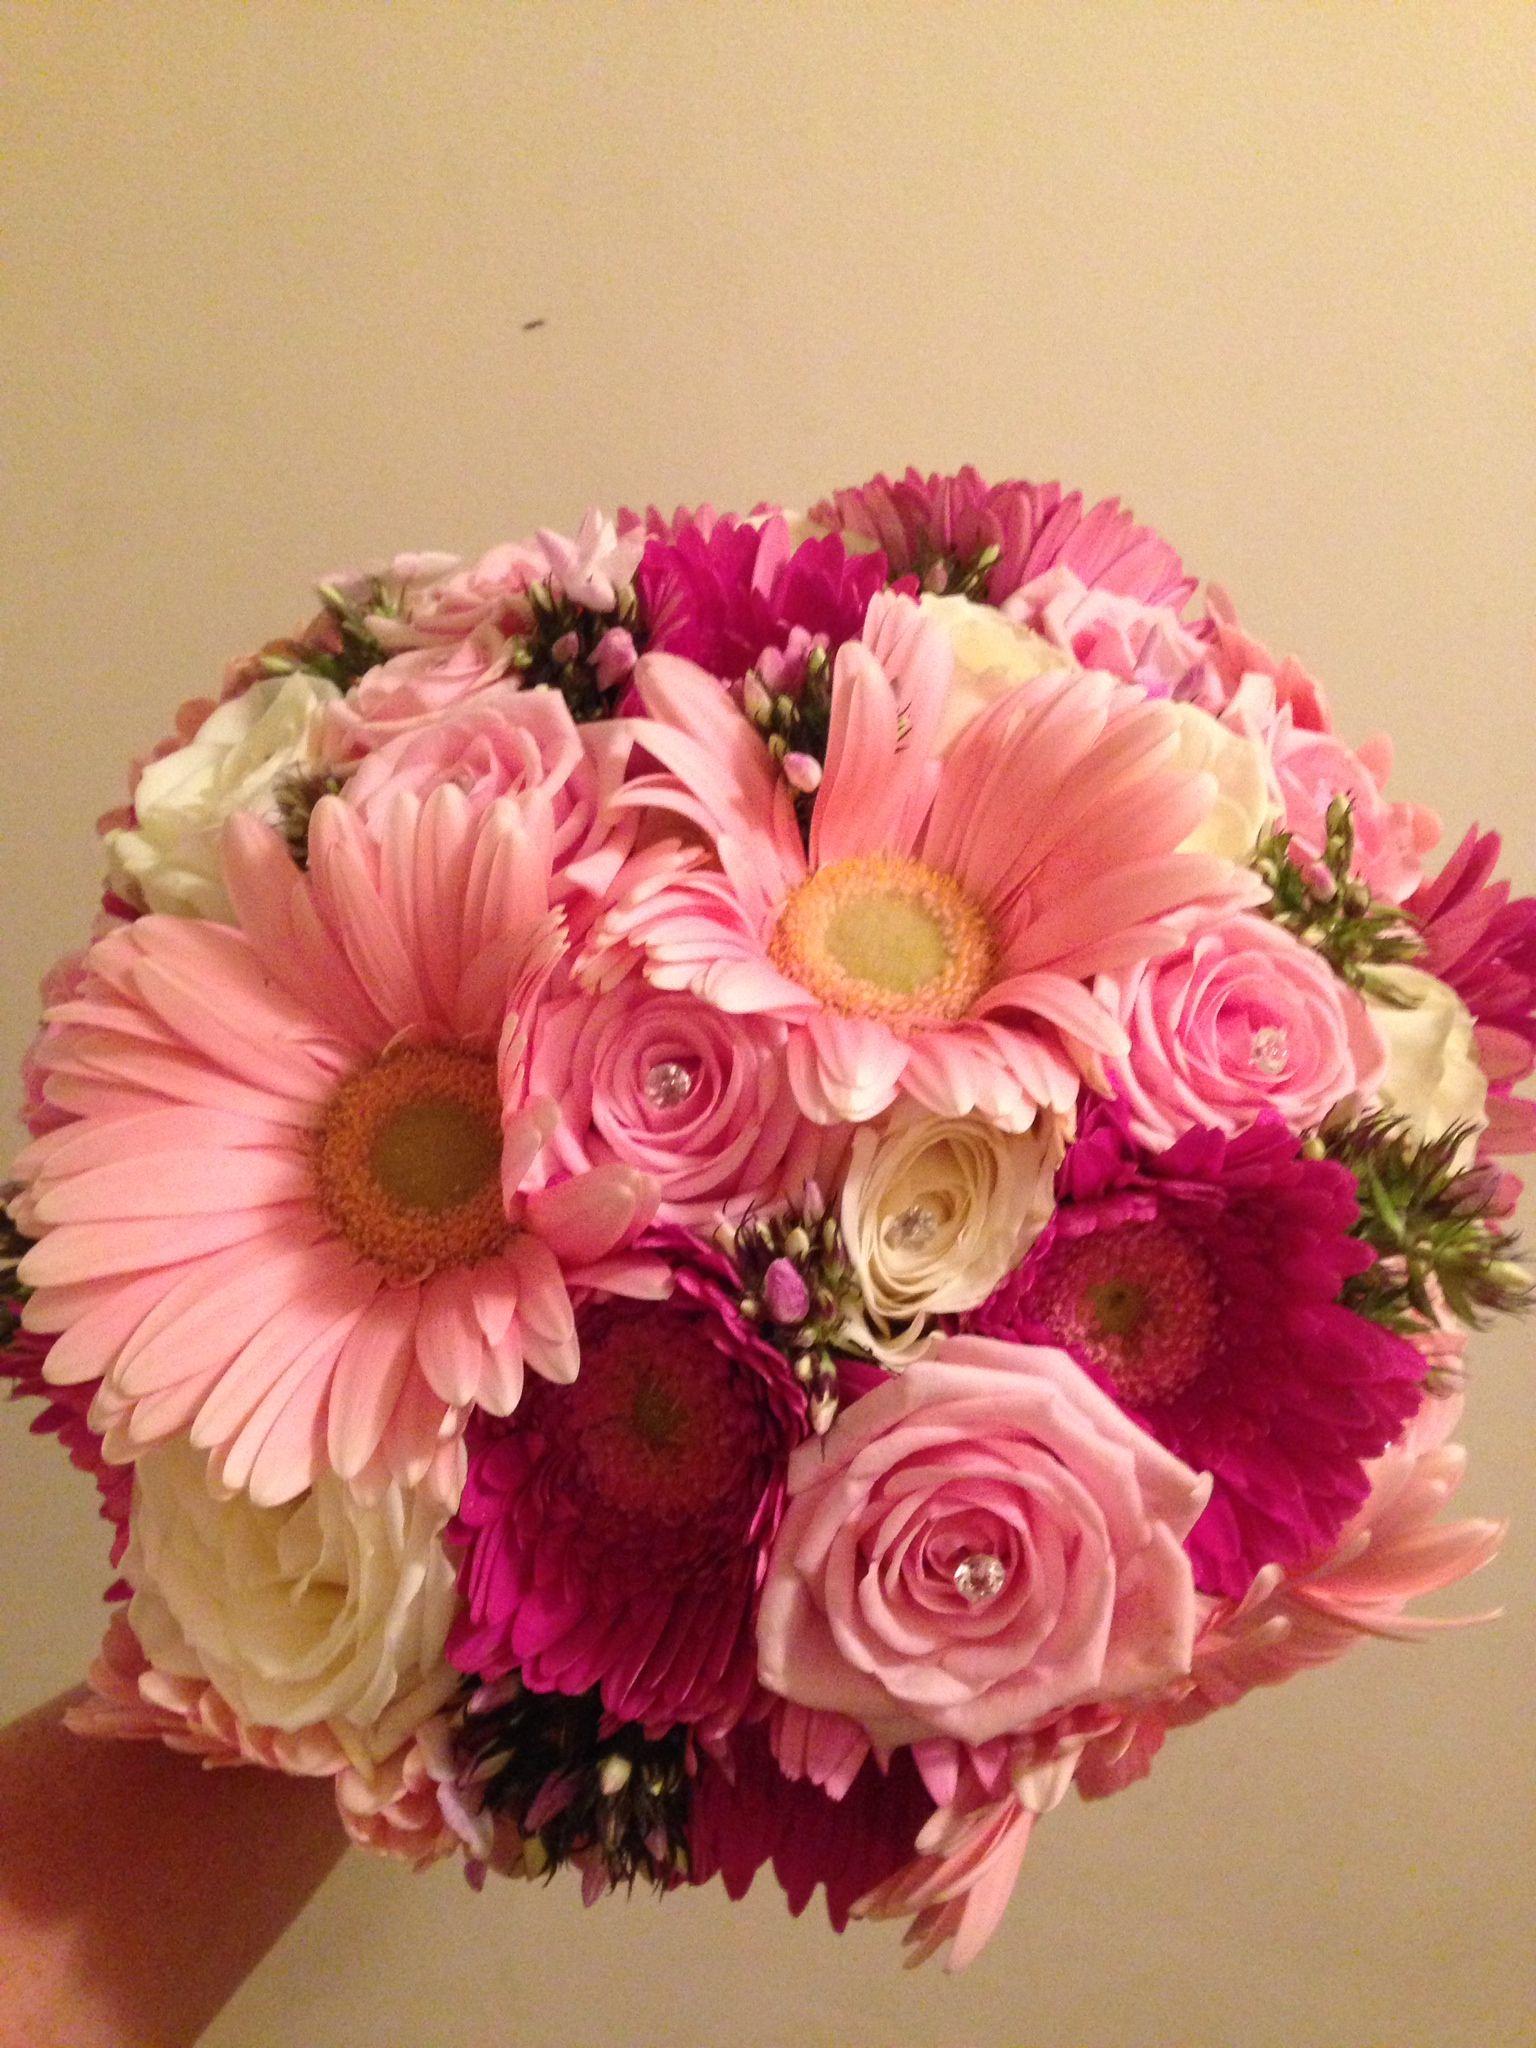 Hot pink and baby pink gerberas pink phlox and cream roses bridal hot pink and baby pink gerberas pink phlox and cream roses bridal bouquet mightylinksfo